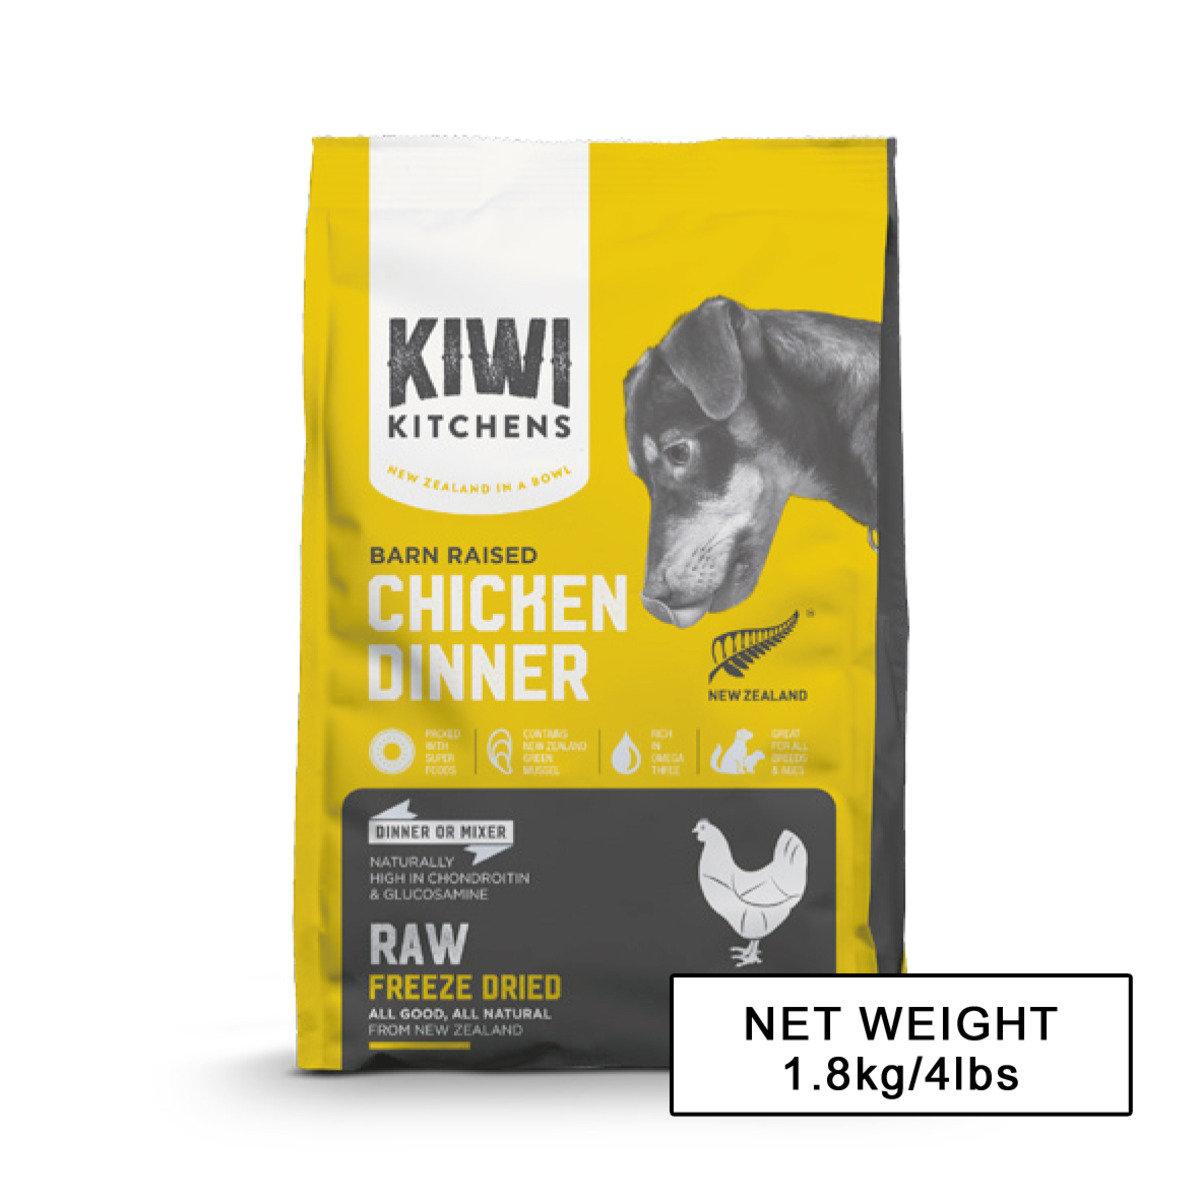 Autarky Mature Chicken Salmon 12kg 71N7KOpqf6L. dog food Archives eurekaanimalfeeds Source · Barn Raised Chicken